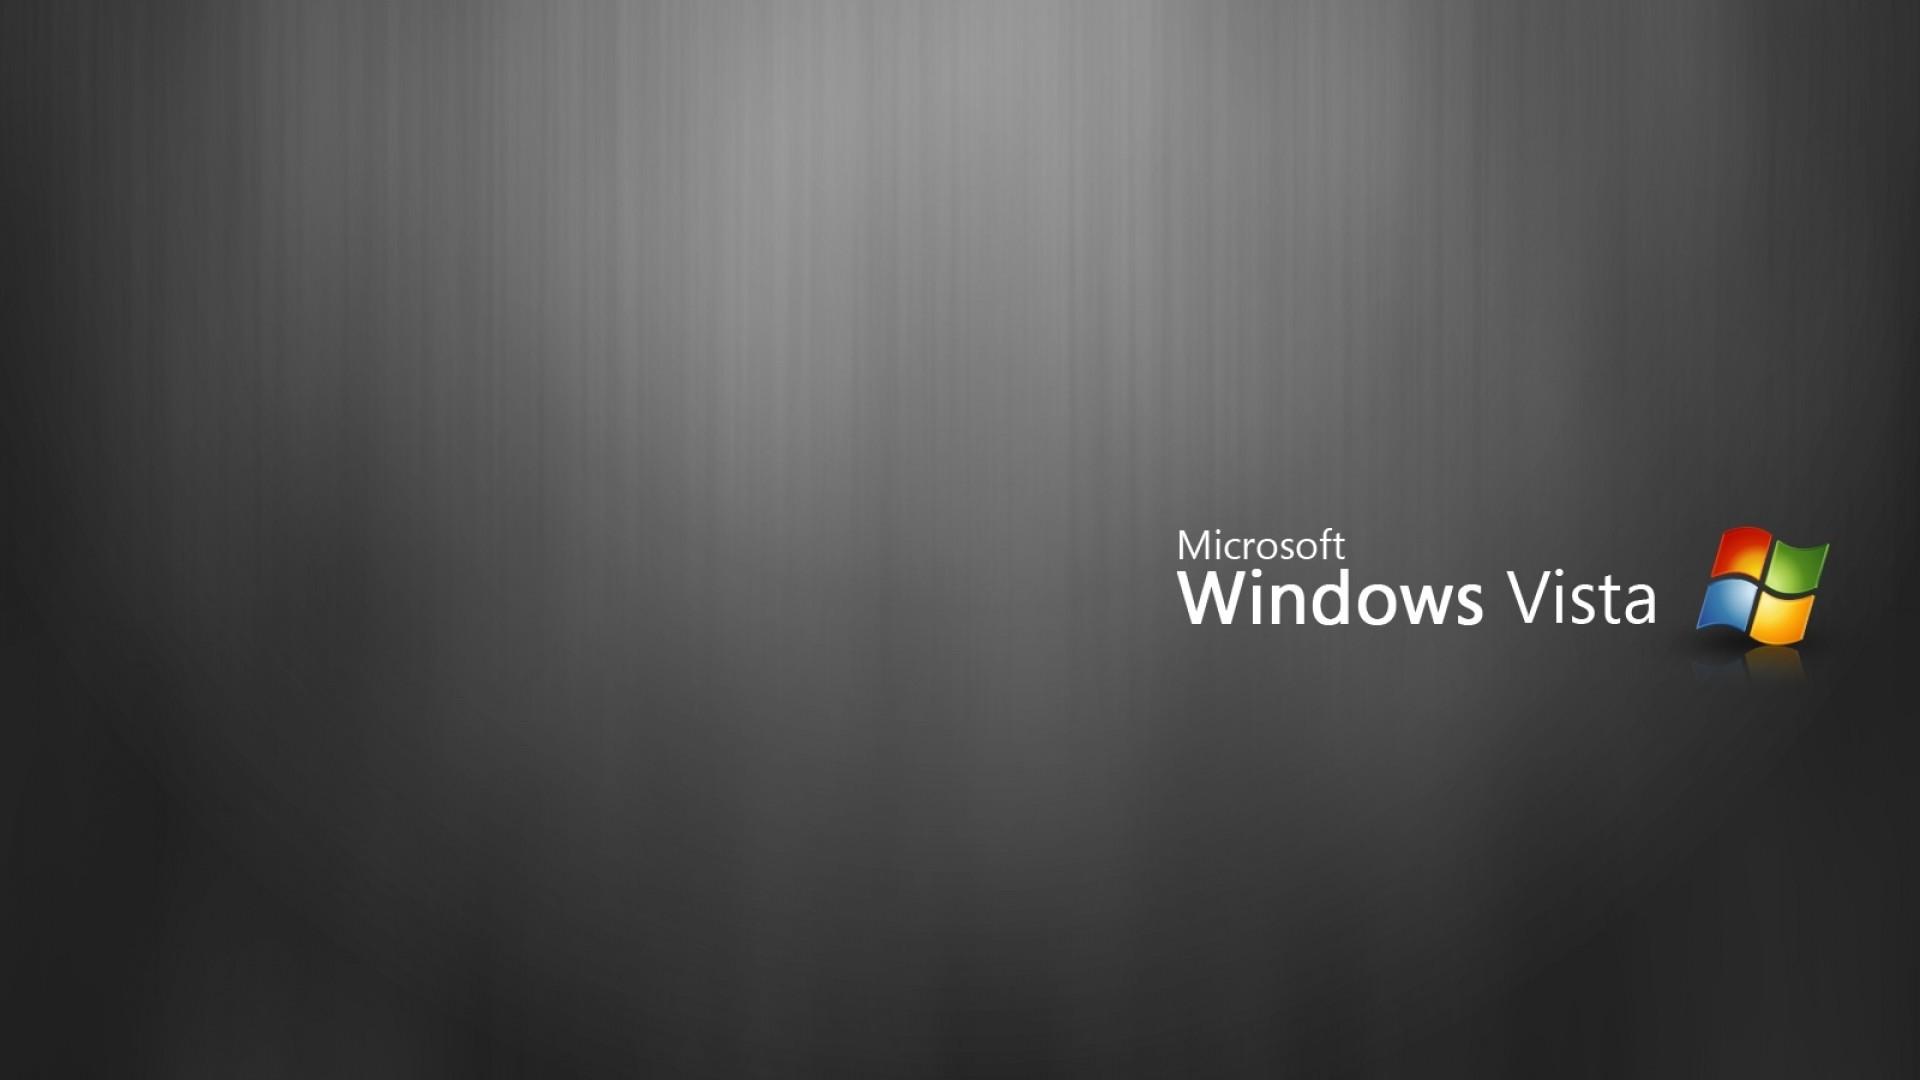 Window vista wallpaper 61 images 1920x1200 windows vista wallpaper set 5 thecheapjerseys Image collections